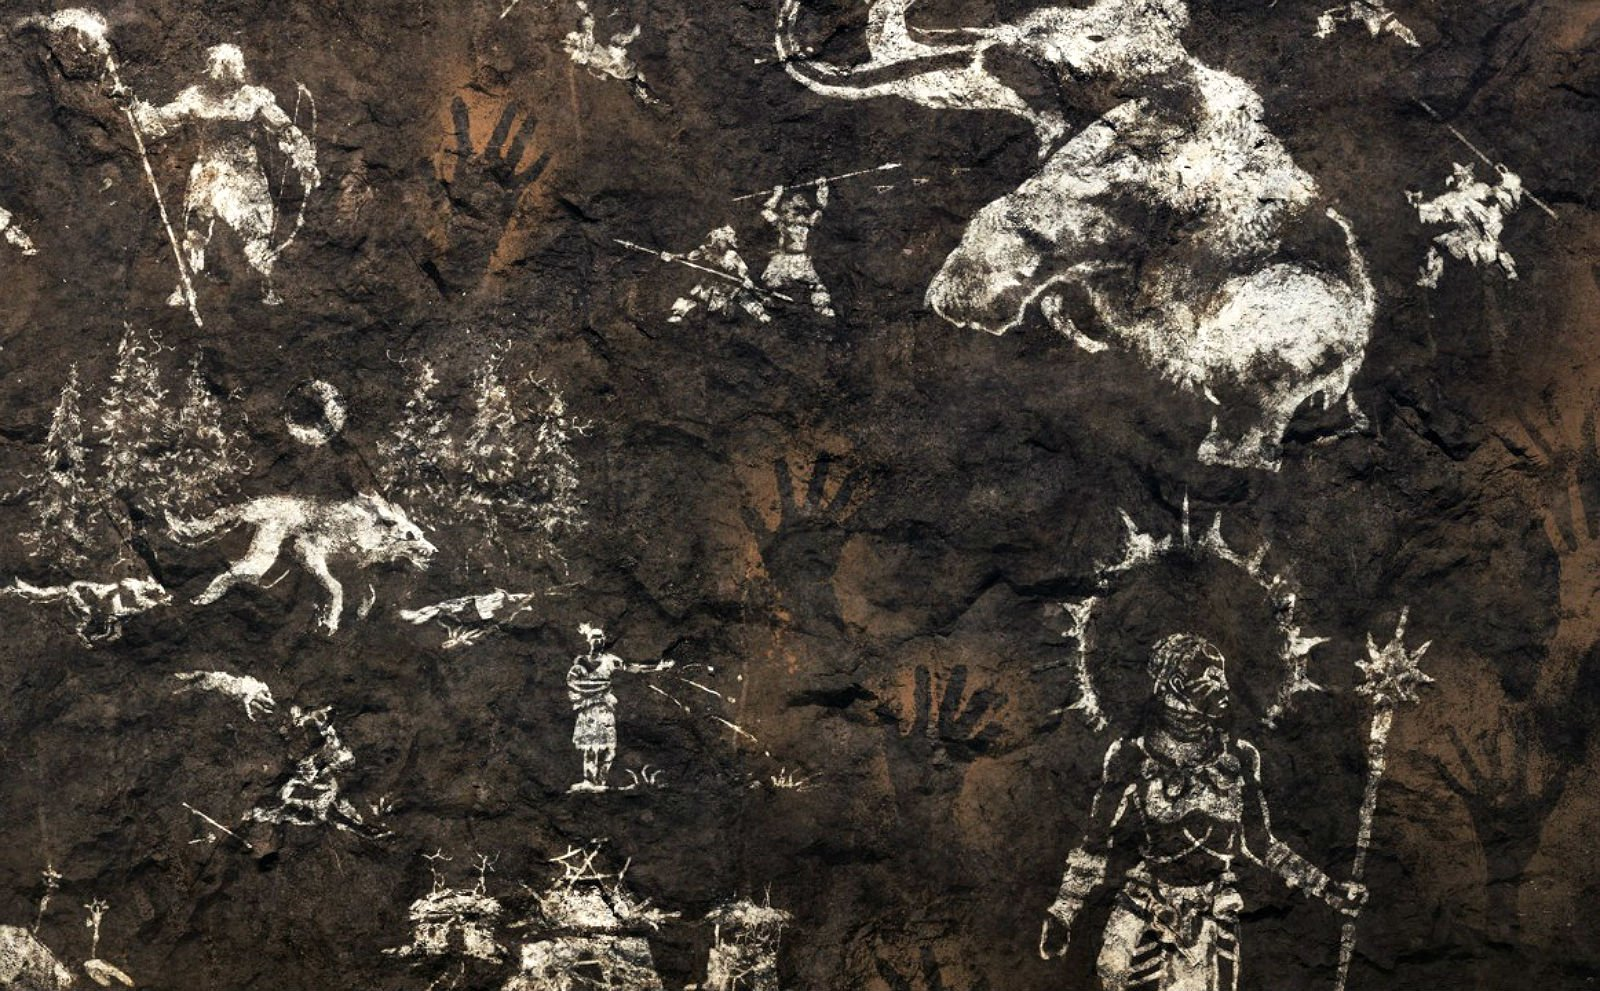 Far Cry Primal Artwork Video Games Wallpapers Hd: Far Cry Primal Wallpapers (24 Wallpapers)